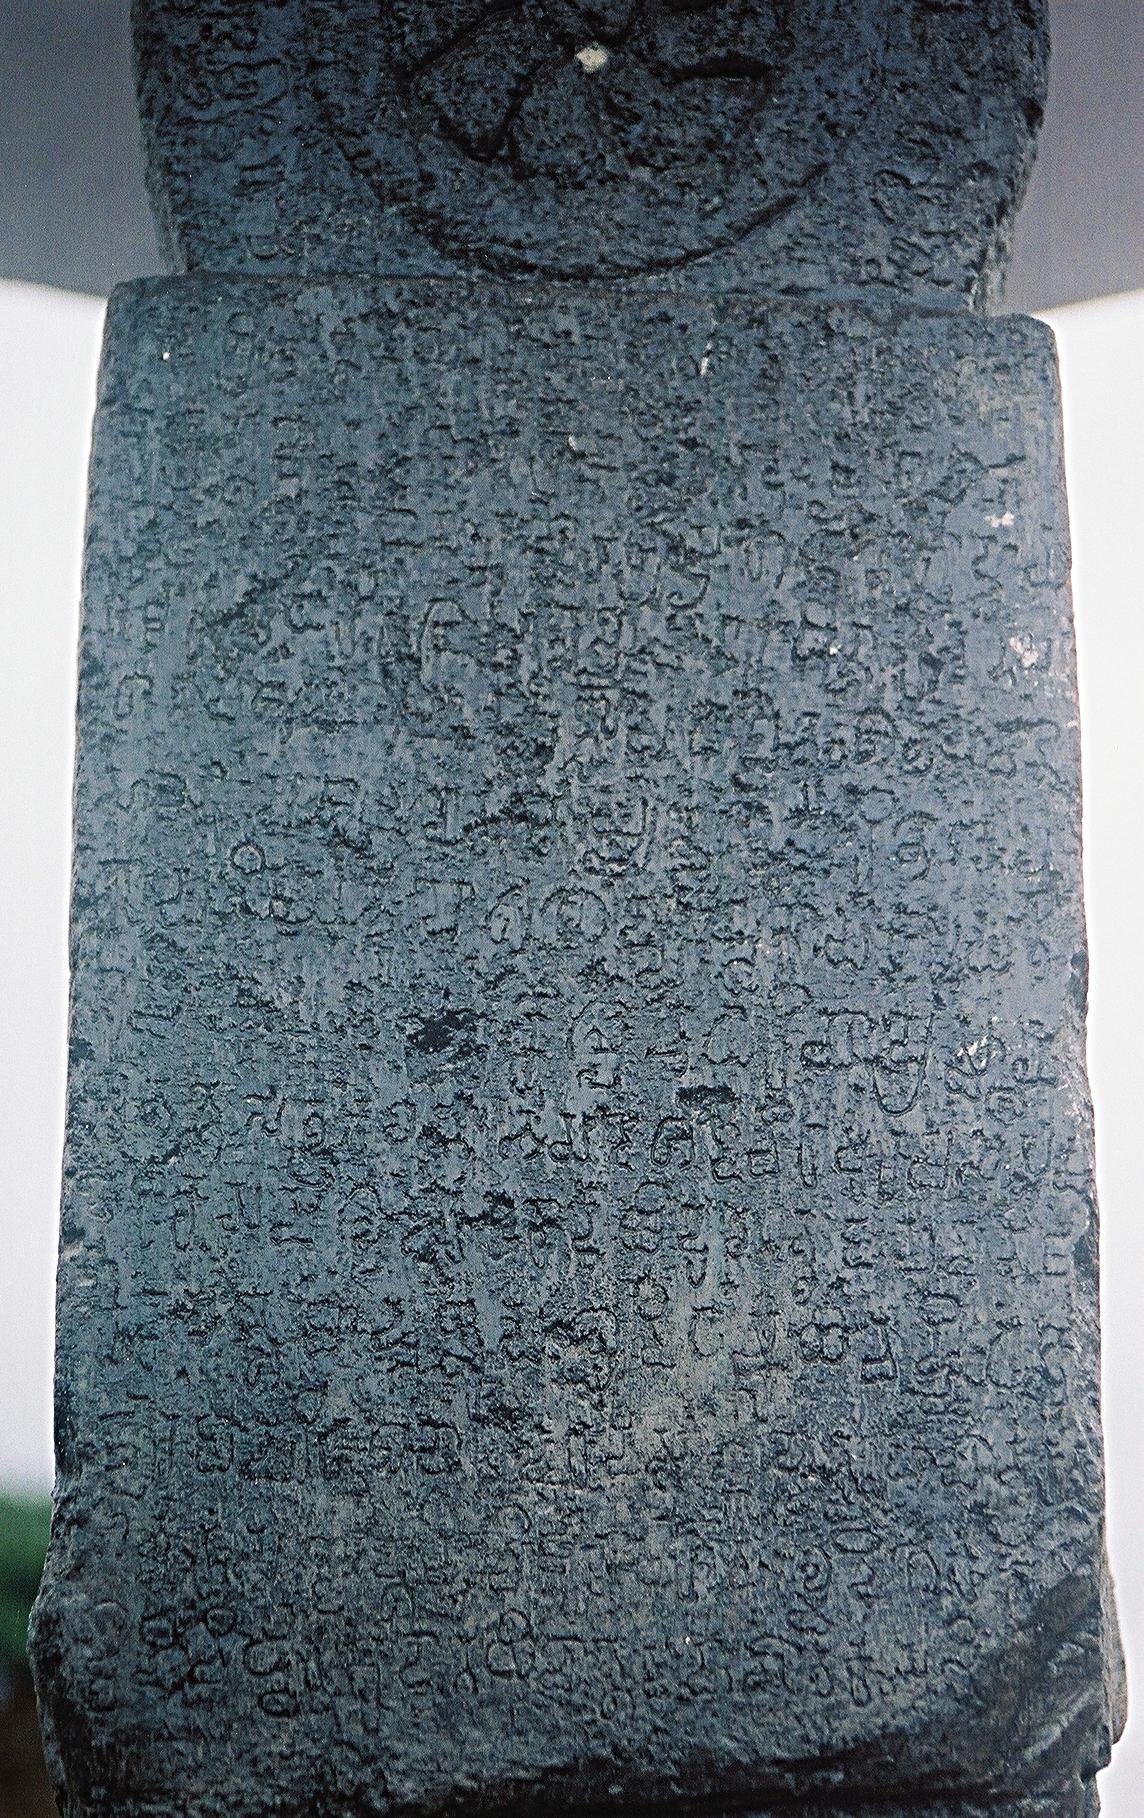 The Halmidi inscription at Halmidi village dated 450 CE. (Kadamba Dynasty)